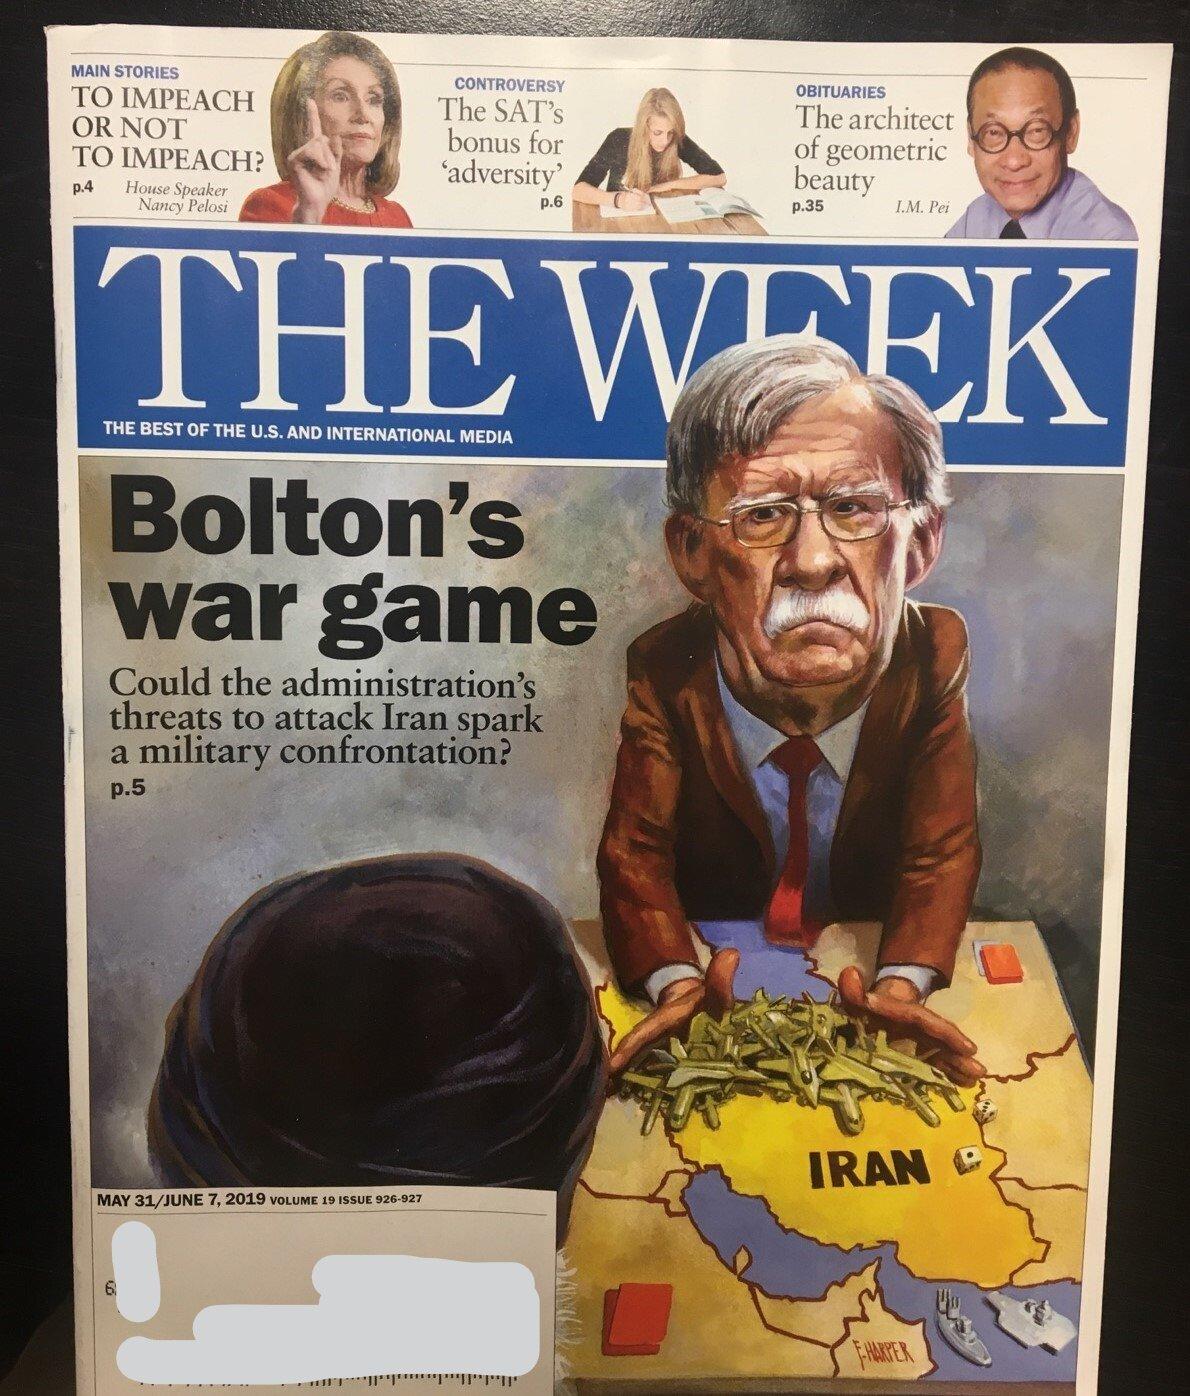 The Week Magazine Cover_LI.jpg